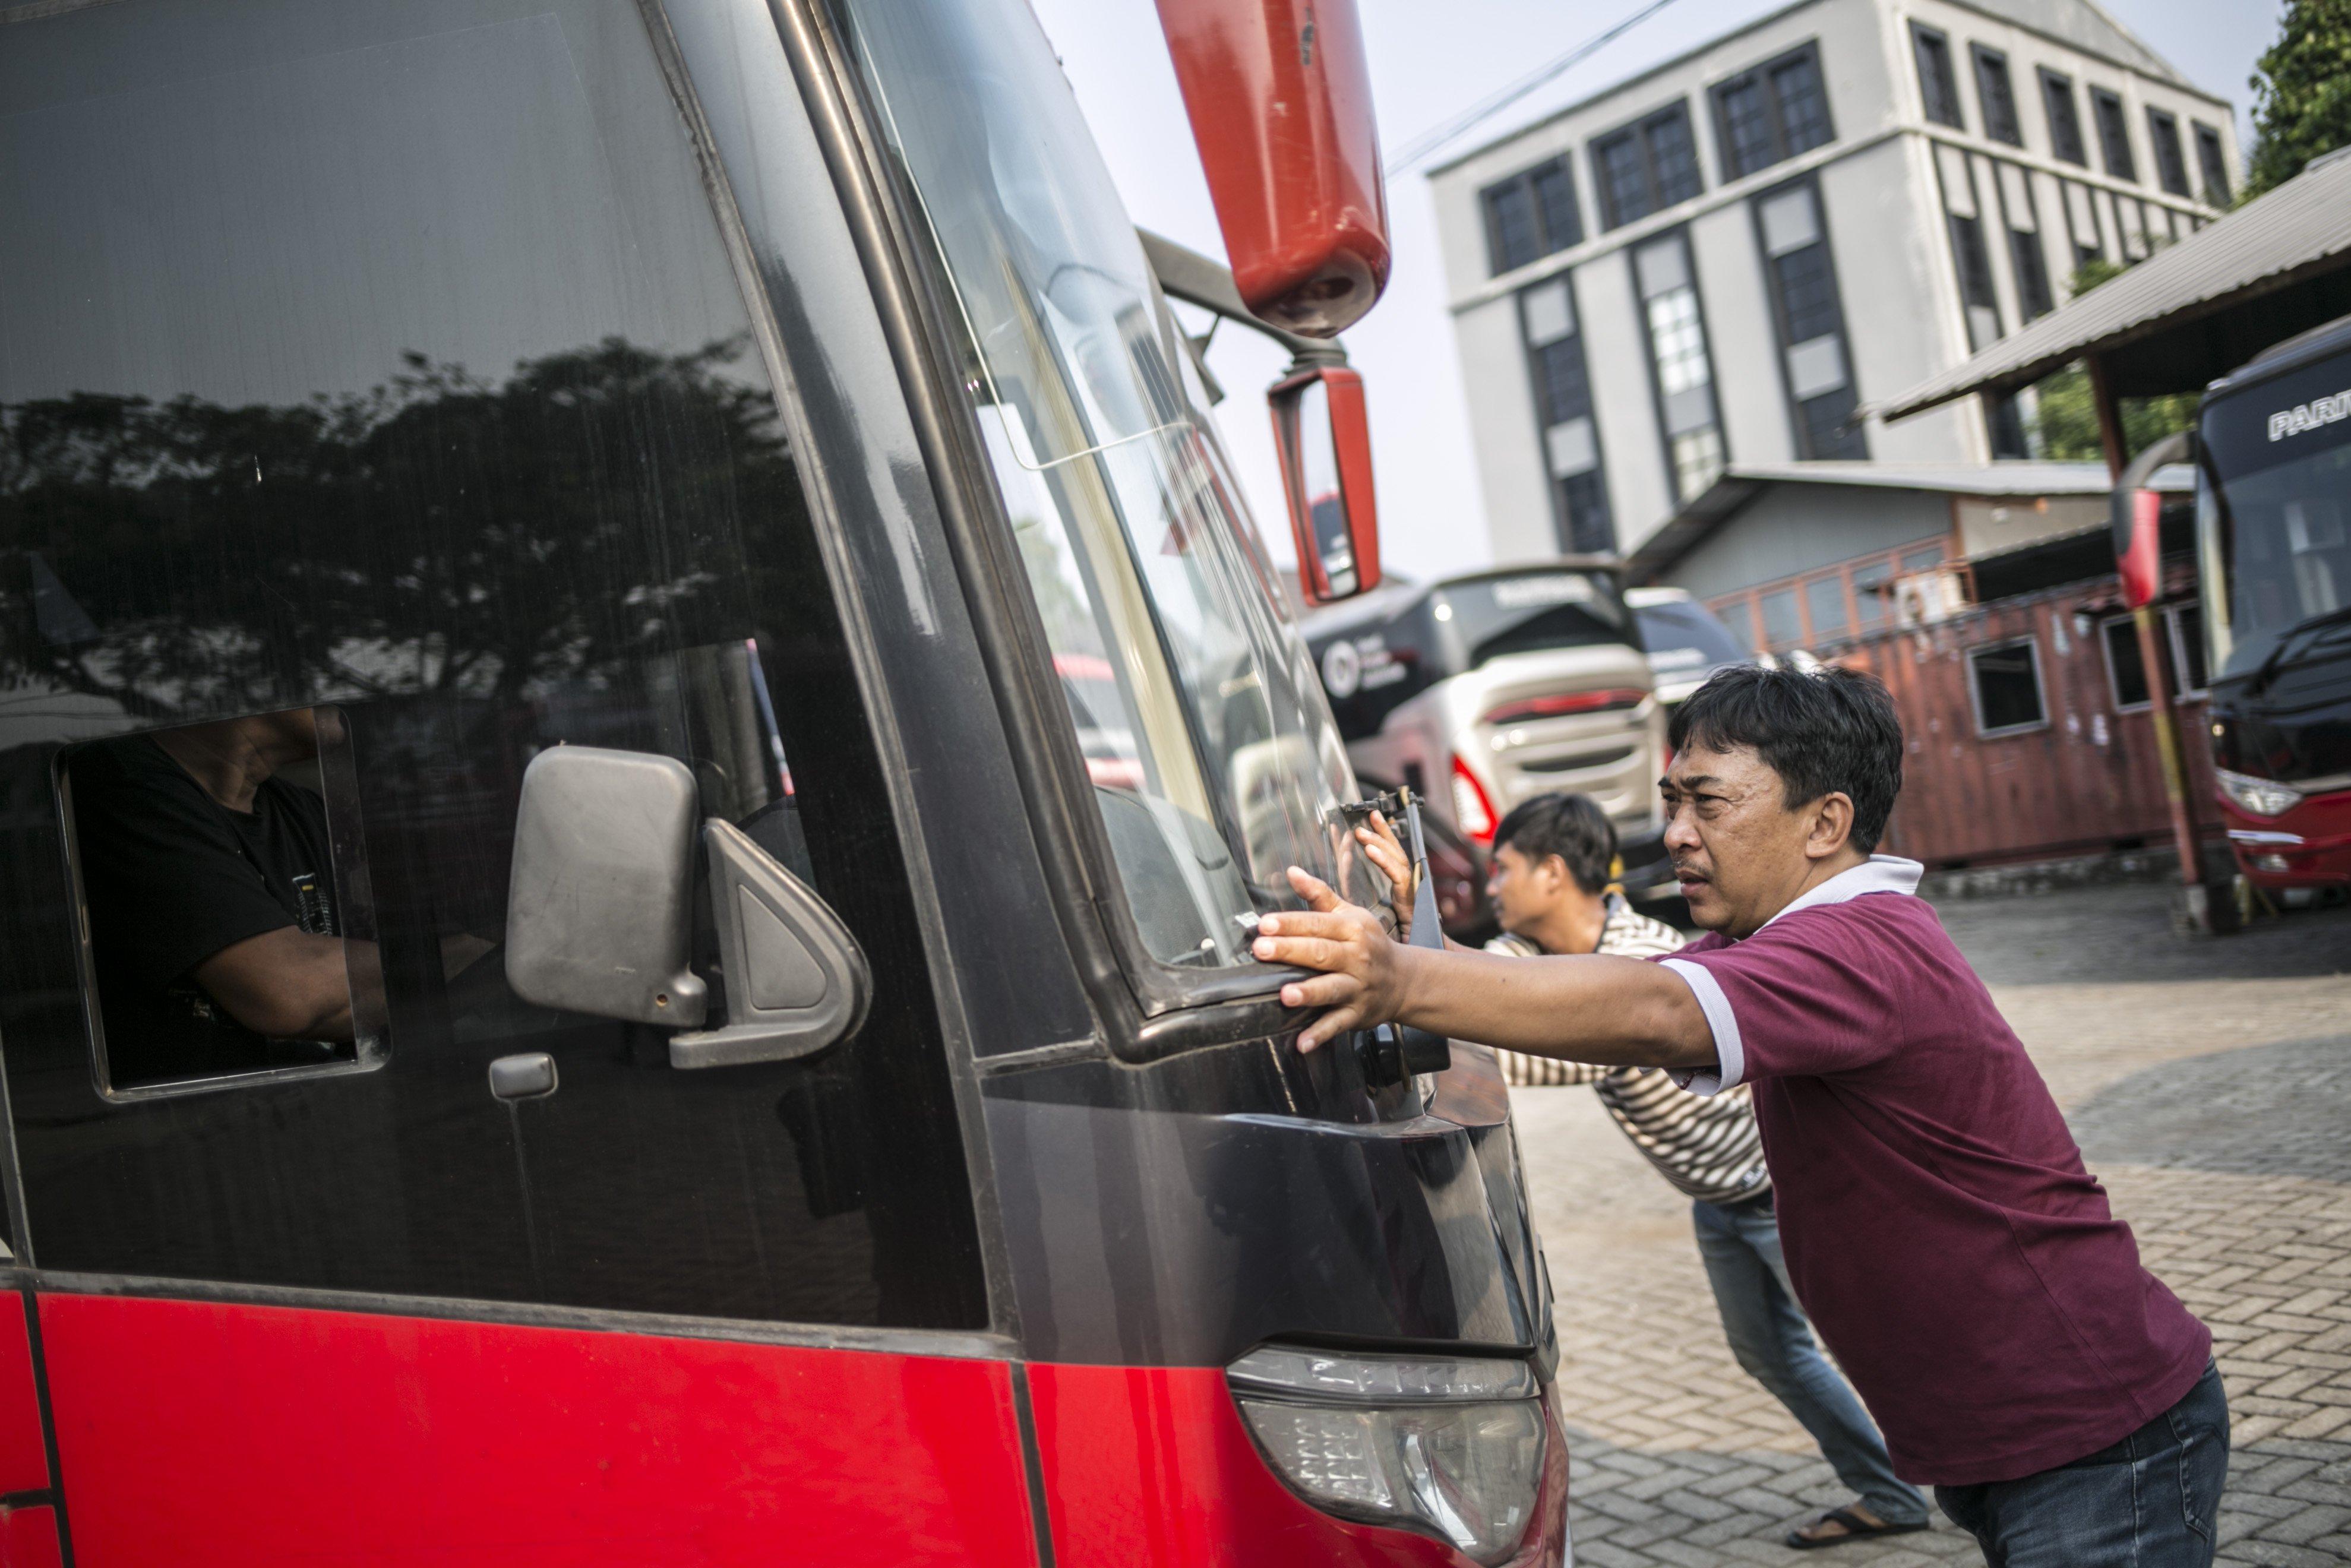 Sejumlah mekanik mendorong bus di salah satu pool bus pariwisata di kawasan Tanjung Barat, Jagakarsa, Jakarta, Selasa (28/7/2020). Masih diberlakukannya Pembatasan Sosial Bersekala Besar (PSBB) dan penutupan tempat rekreasi akibat Covid-19, berimbas pada jasa transportasi pariwisata. Sejak bulan Maret pengelola mengaku mengalami penurunan pendapatan dan penyewaan bus hingga 80%.